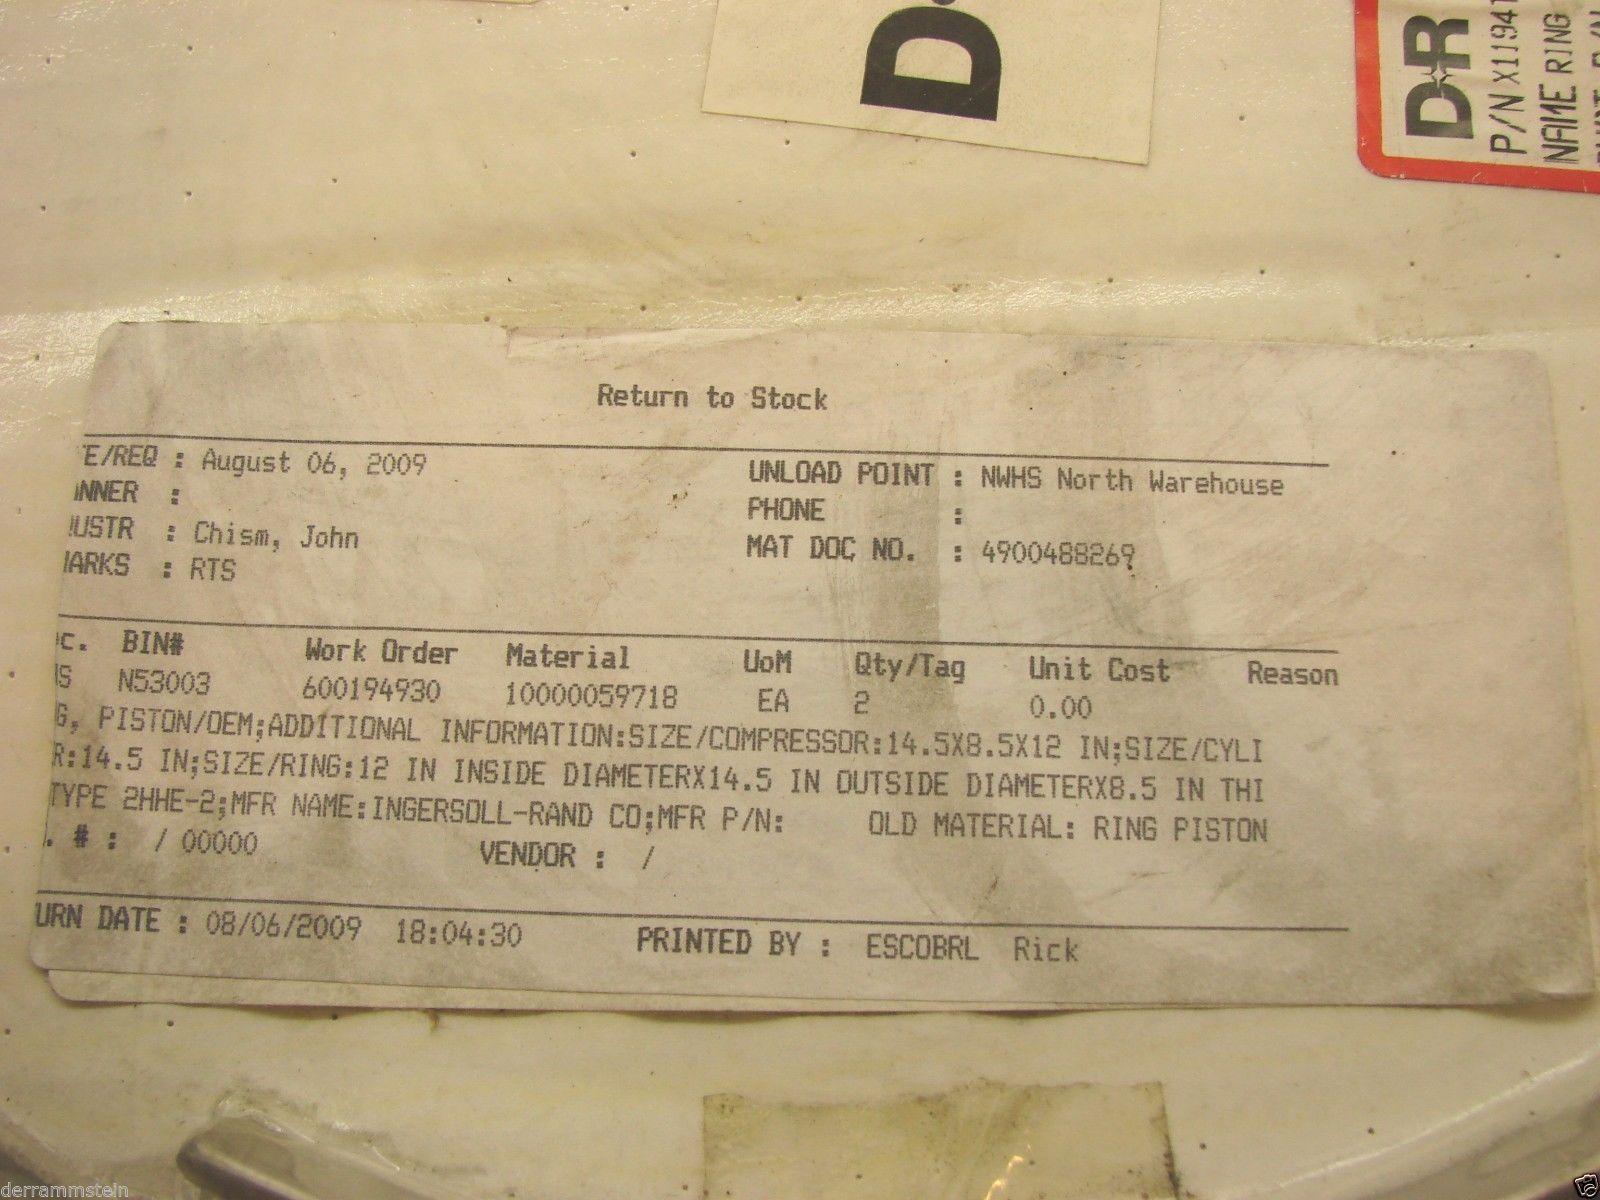 New (2) Dresser Rand X1194T 14.5 X  75CL  Piston Ring OEM Ring #1 & #2  b79